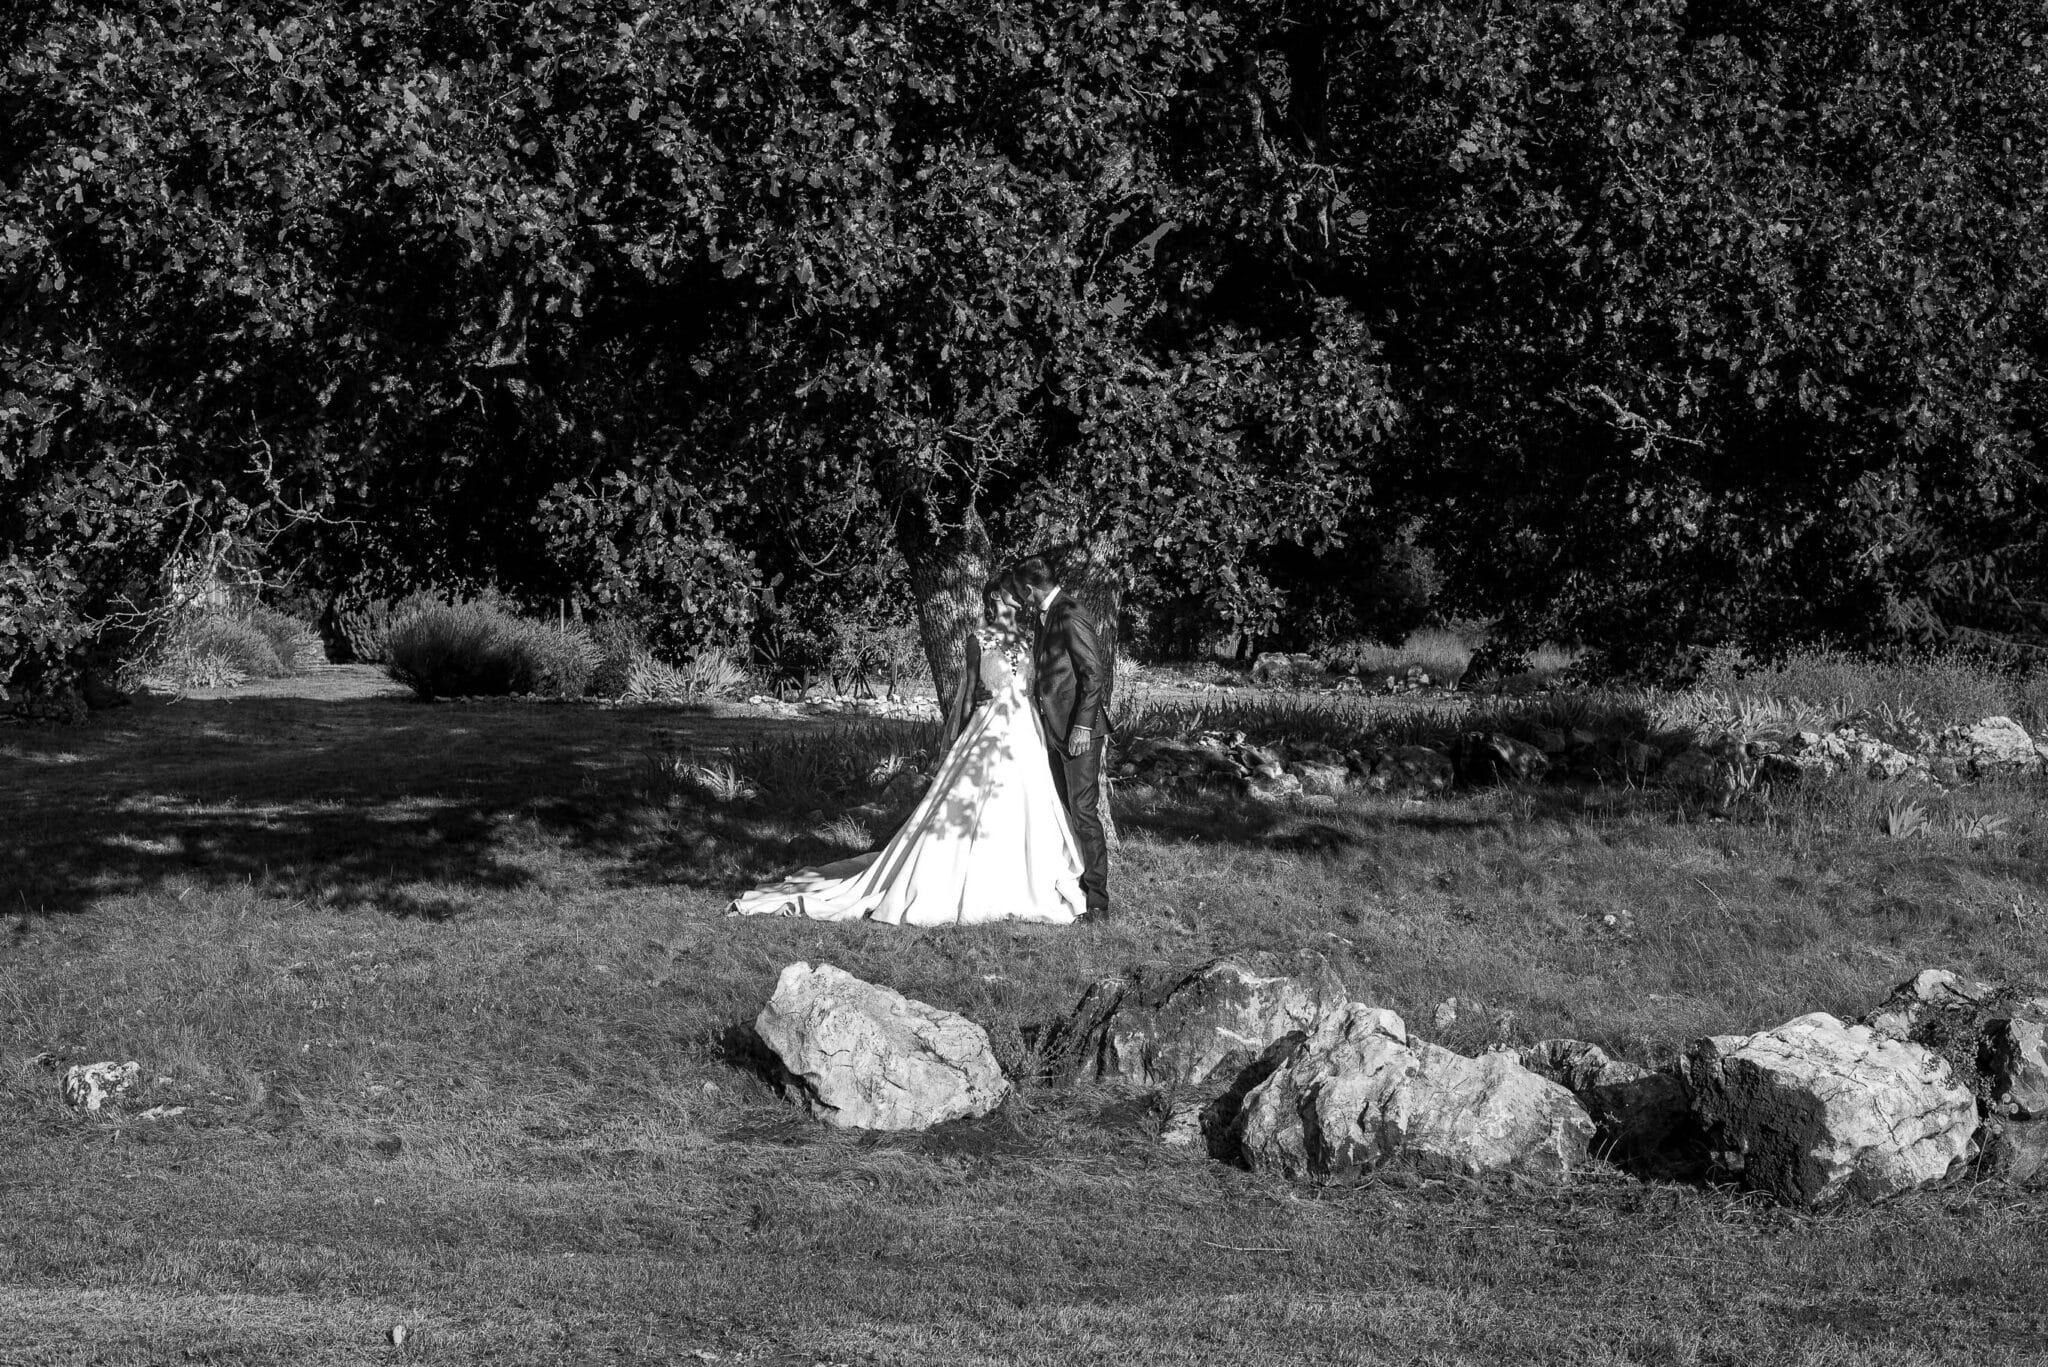 The newlyweds under under the hundred-year-old oak tree